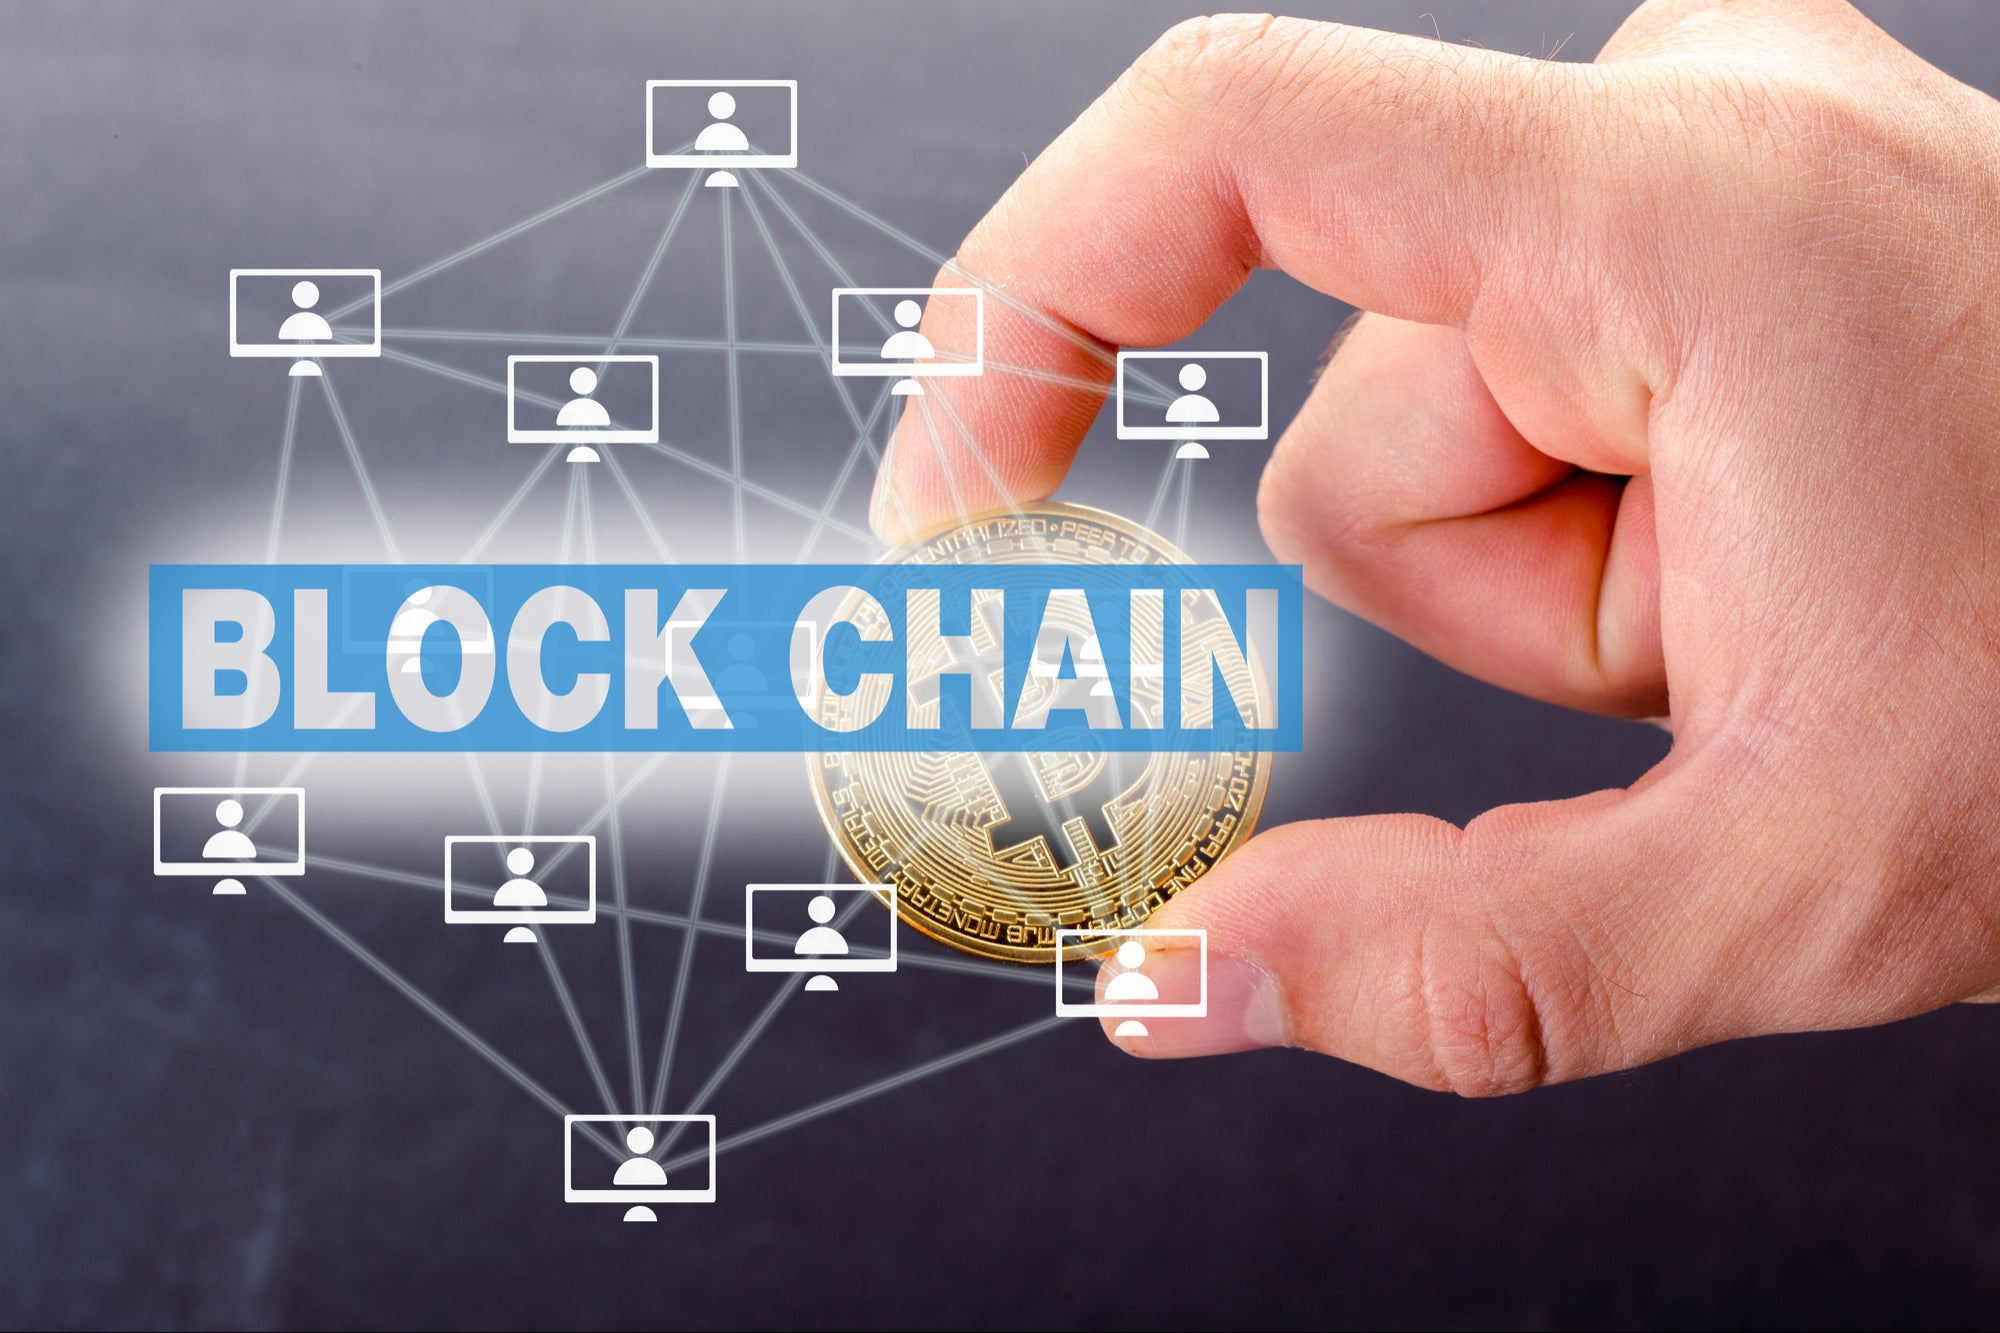 Finnovista extends the deadline to participate in a study on Blockchain